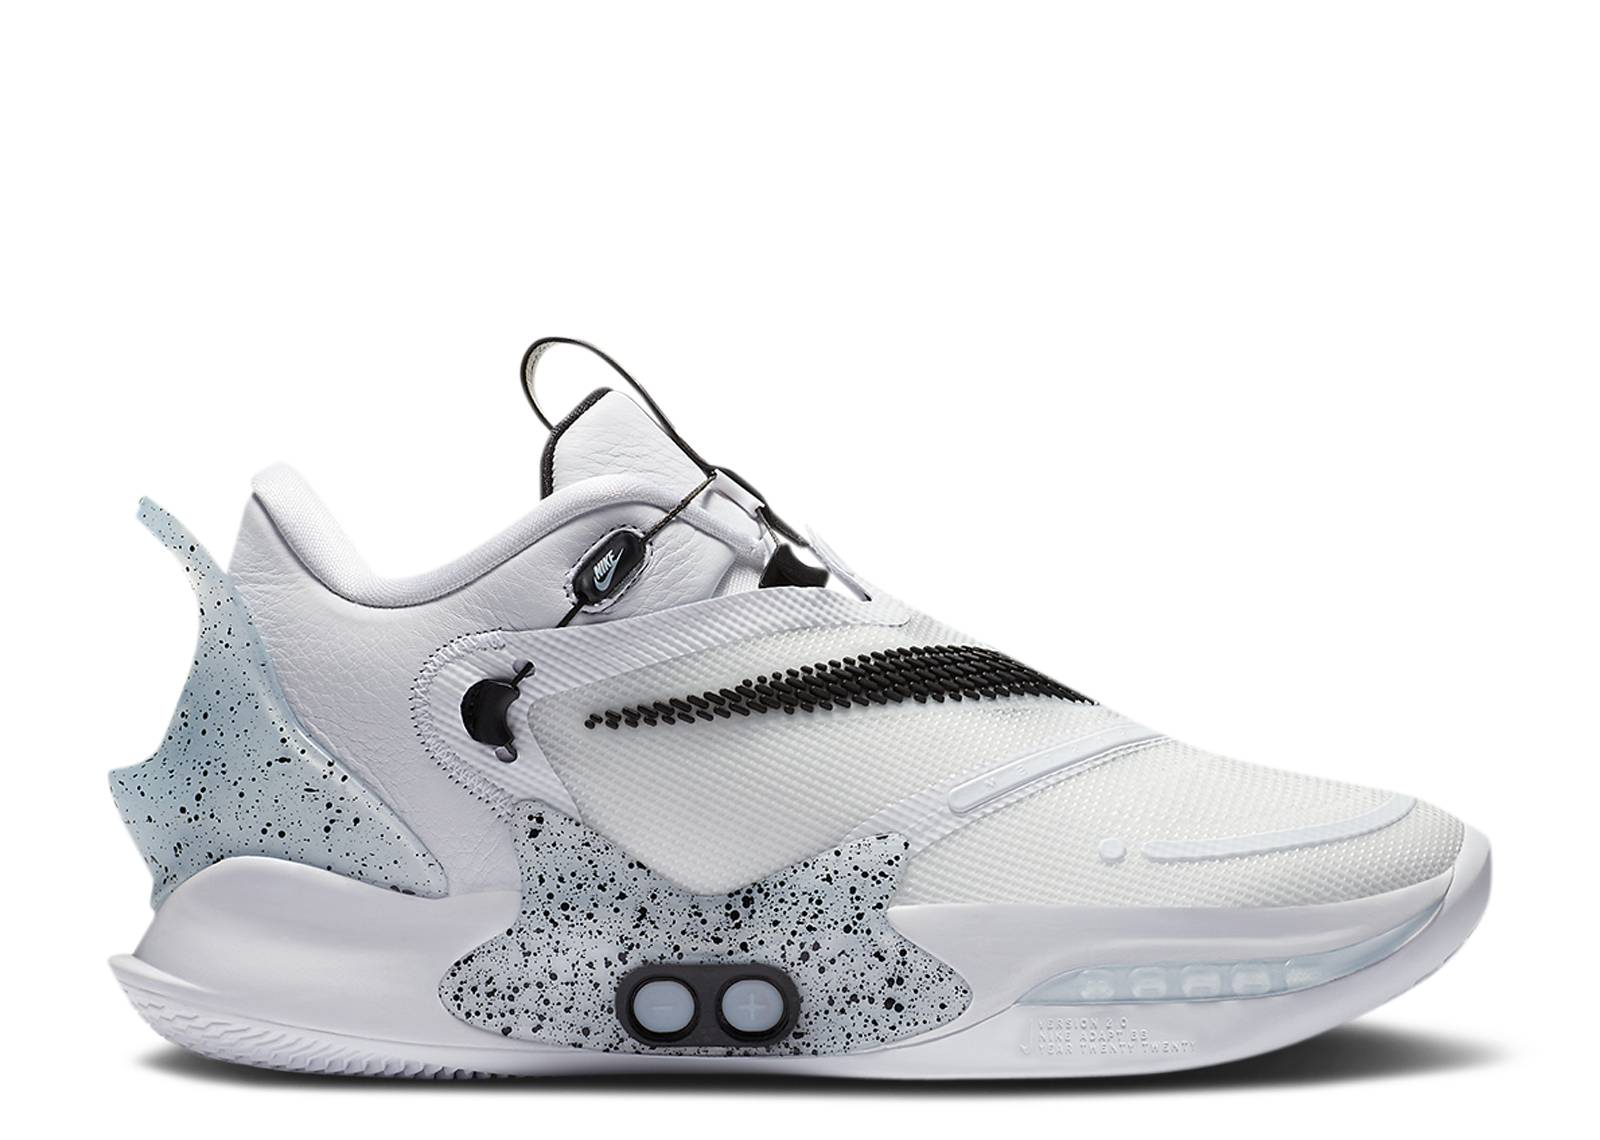 Adapt Bb 2 0 Oreo Eu Charger Nike Cv2441 101 White Black Cement Grey Flight Club